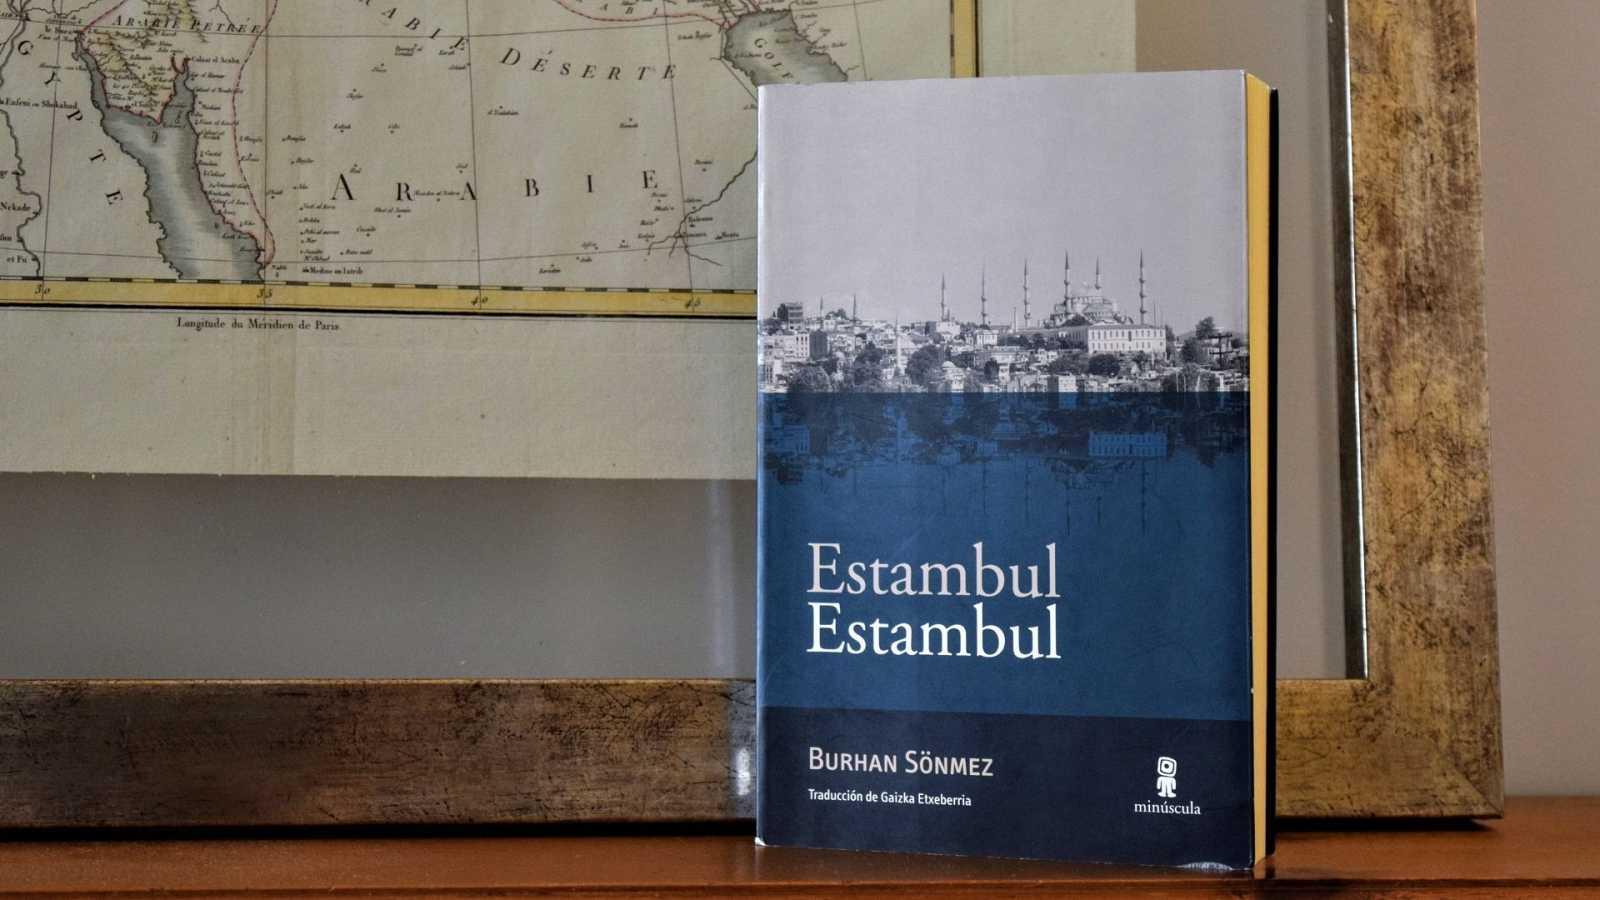 Oxiana - Burhan Sönmez | Estambul Estambul - Escuchar ahora